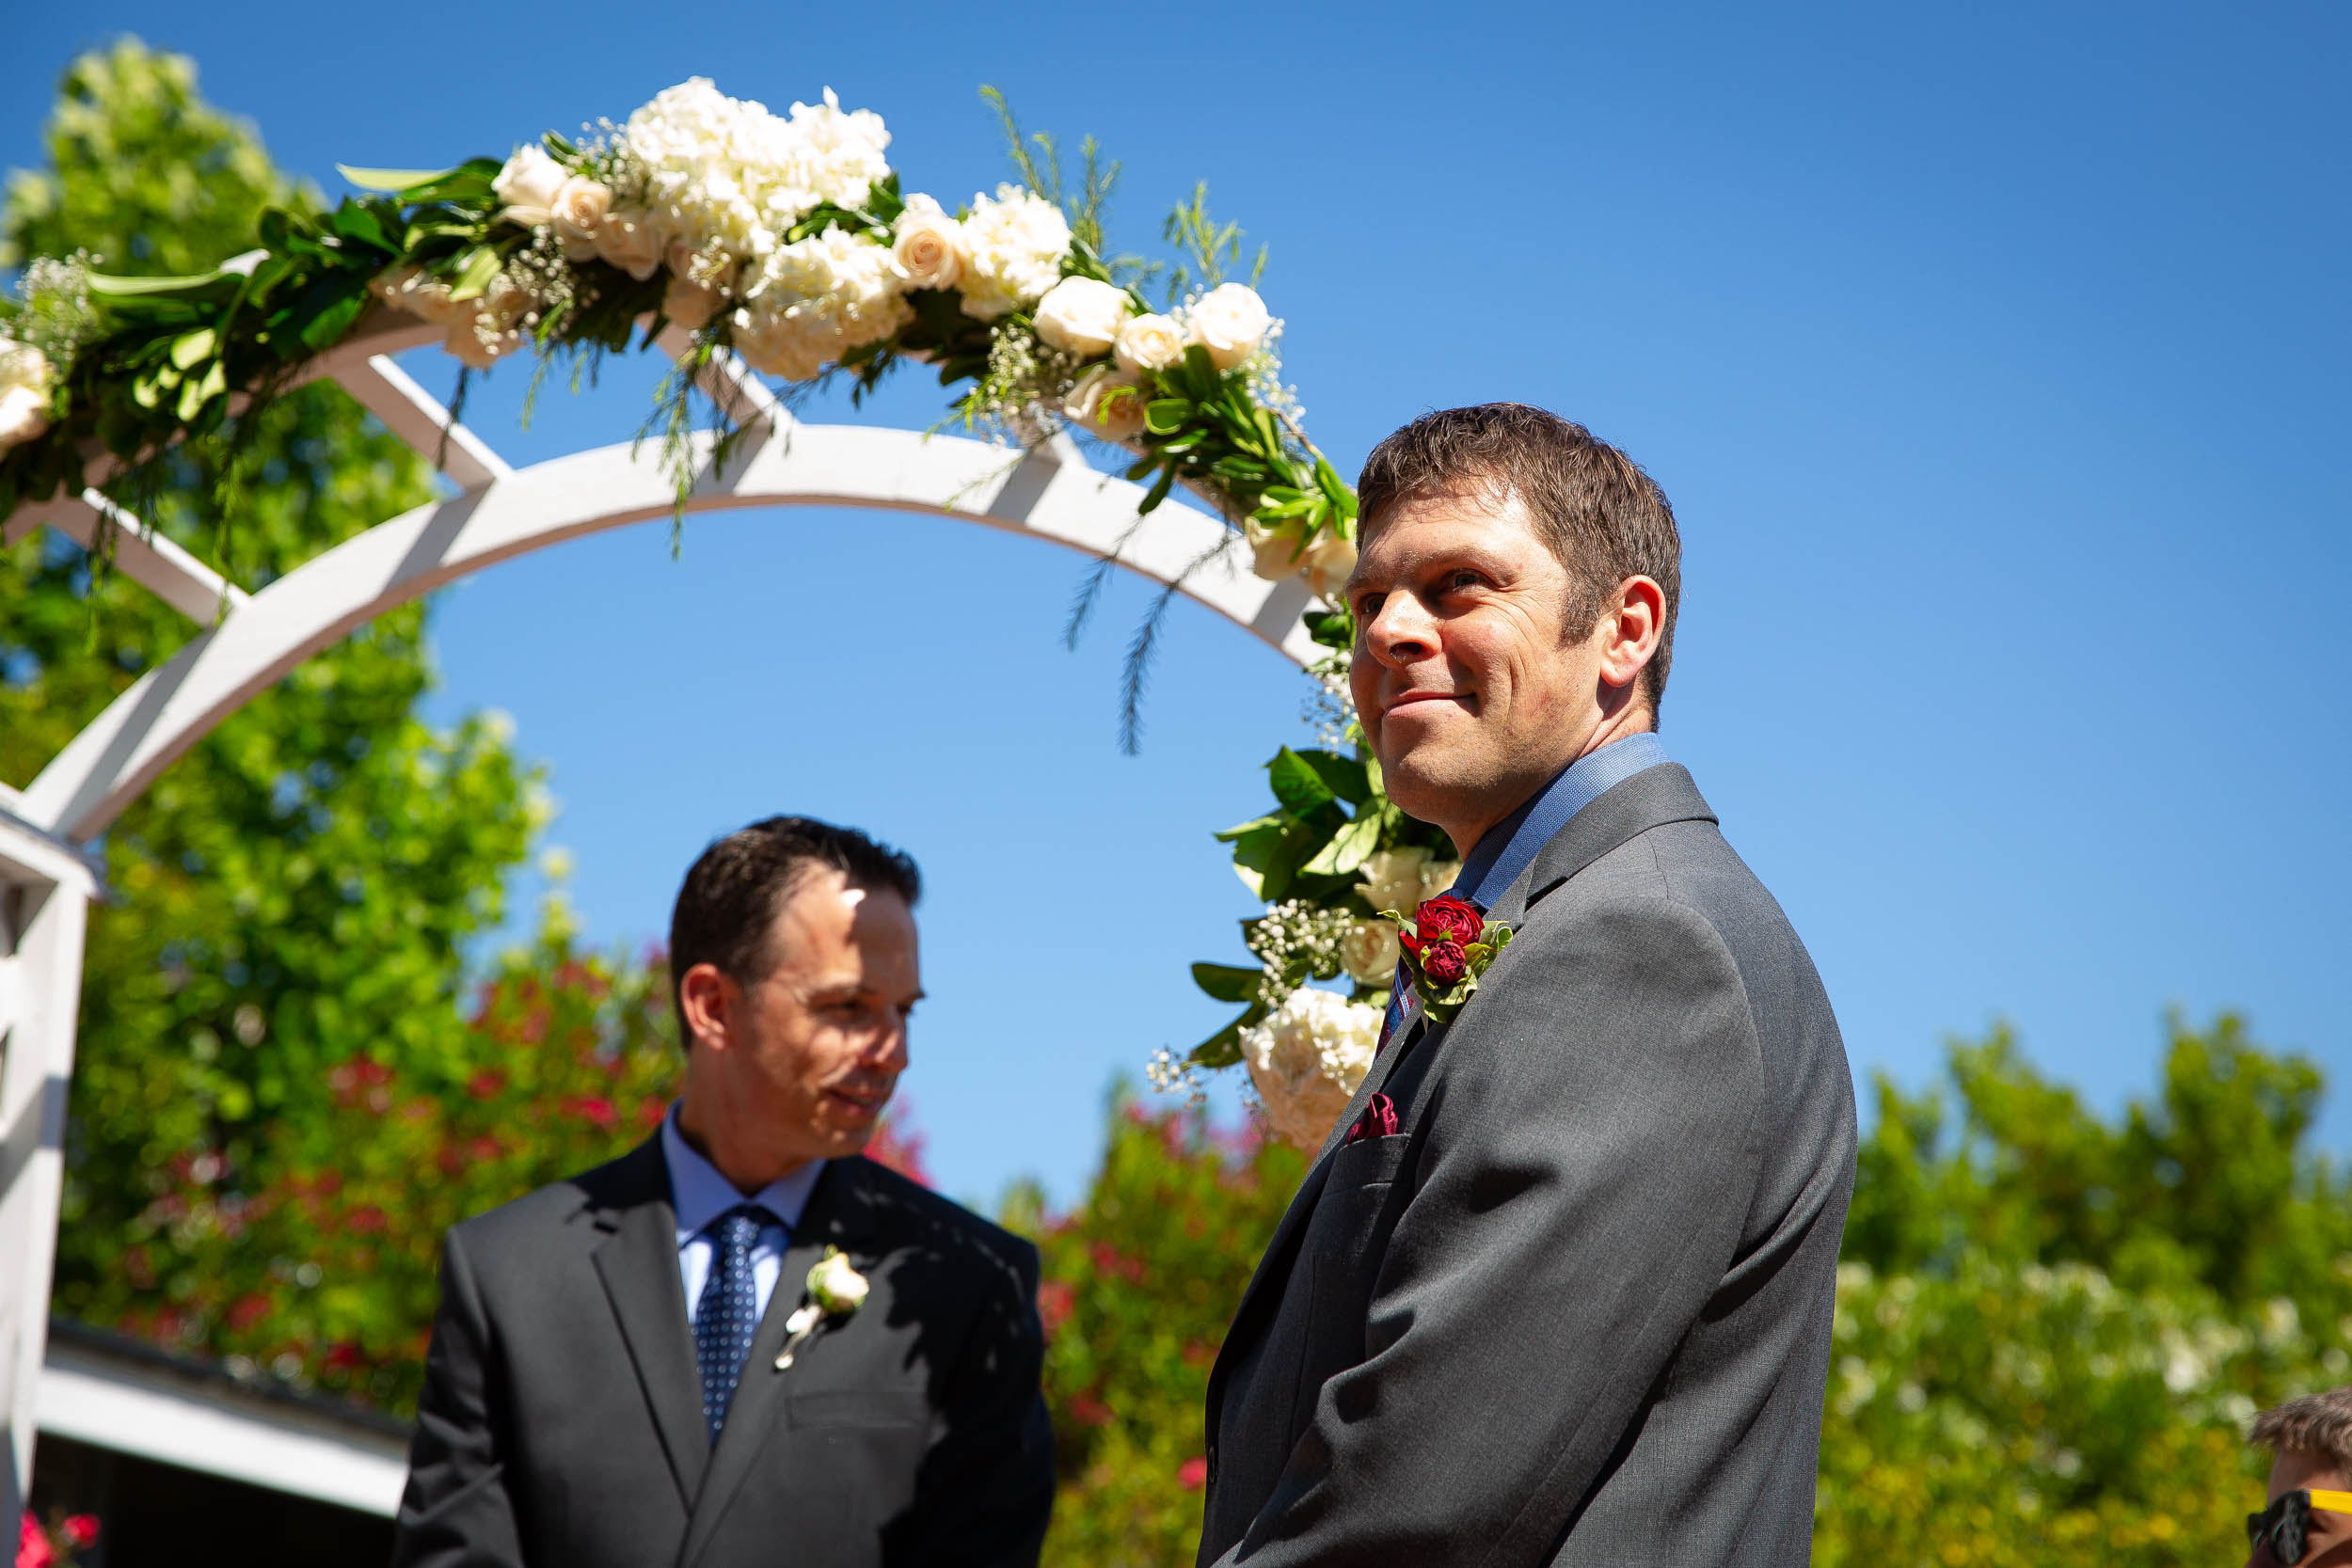 Intimate San Francisco Backyard Wedding-Alison and Joseph-17.jpg